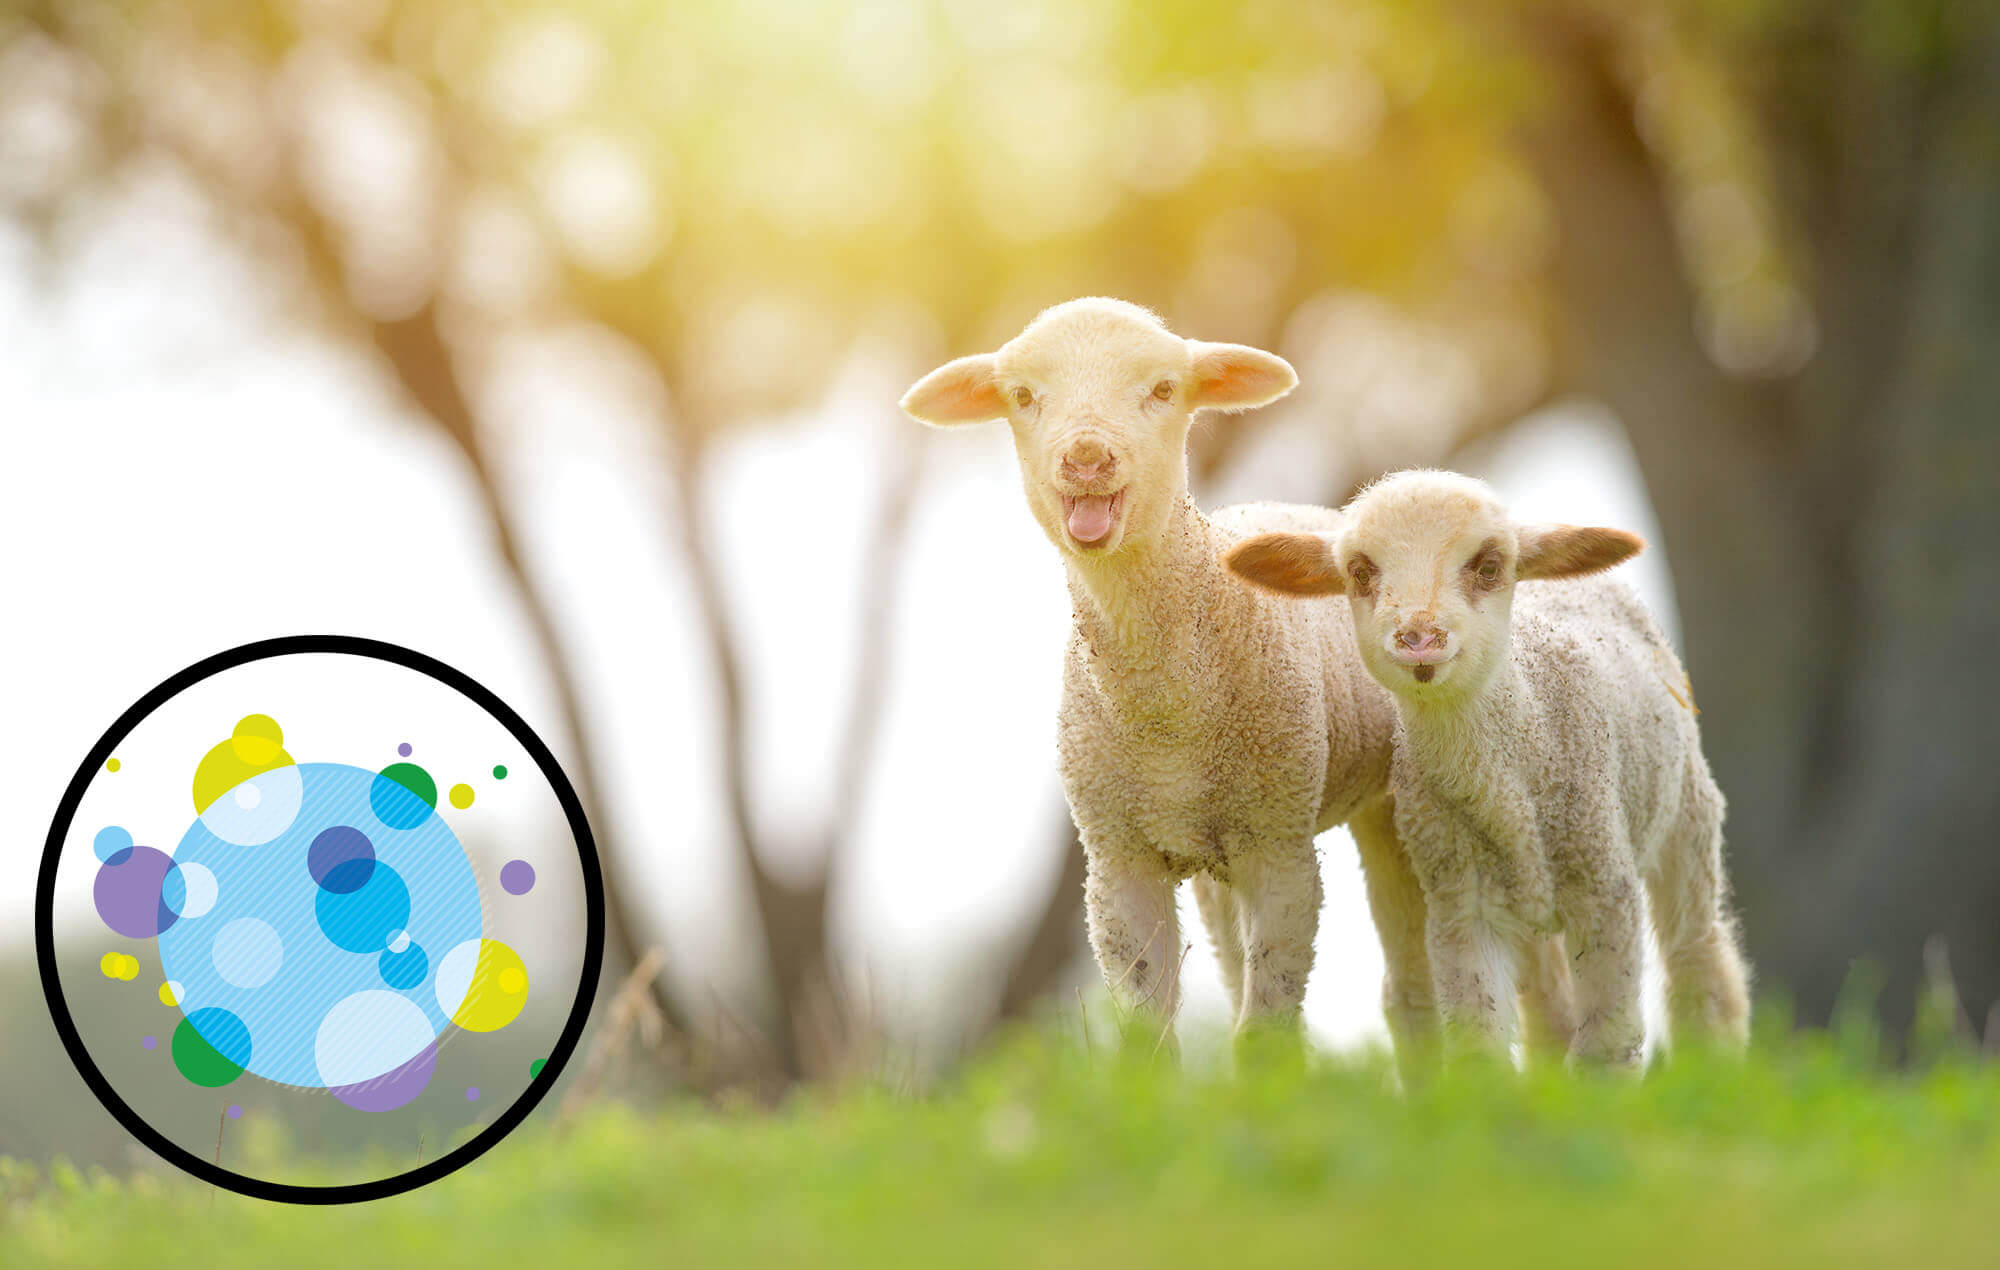 Help end factory farming